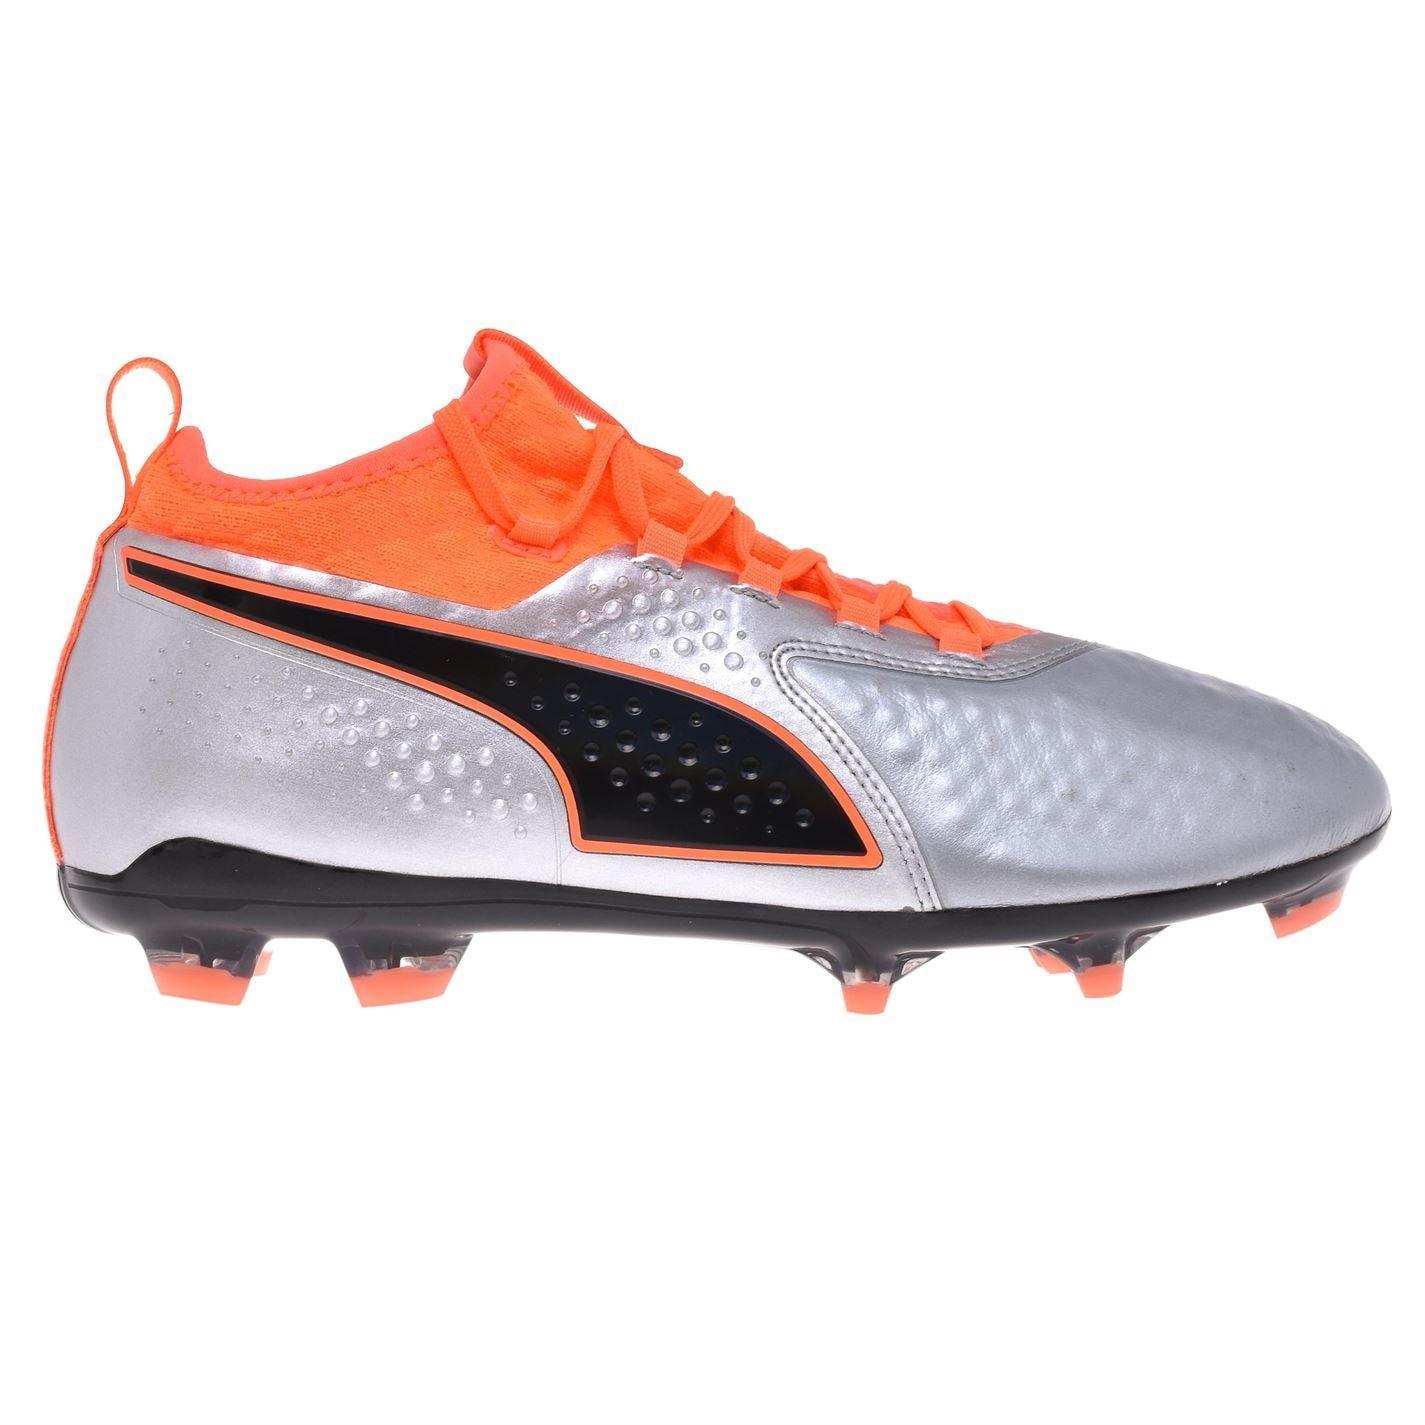 miniature 10 - Puma-One-2-Cuir-engins-fixes-Terre-Ferme-Chaussures-De-Football-Homme-Chaussures-de-foot-crampons